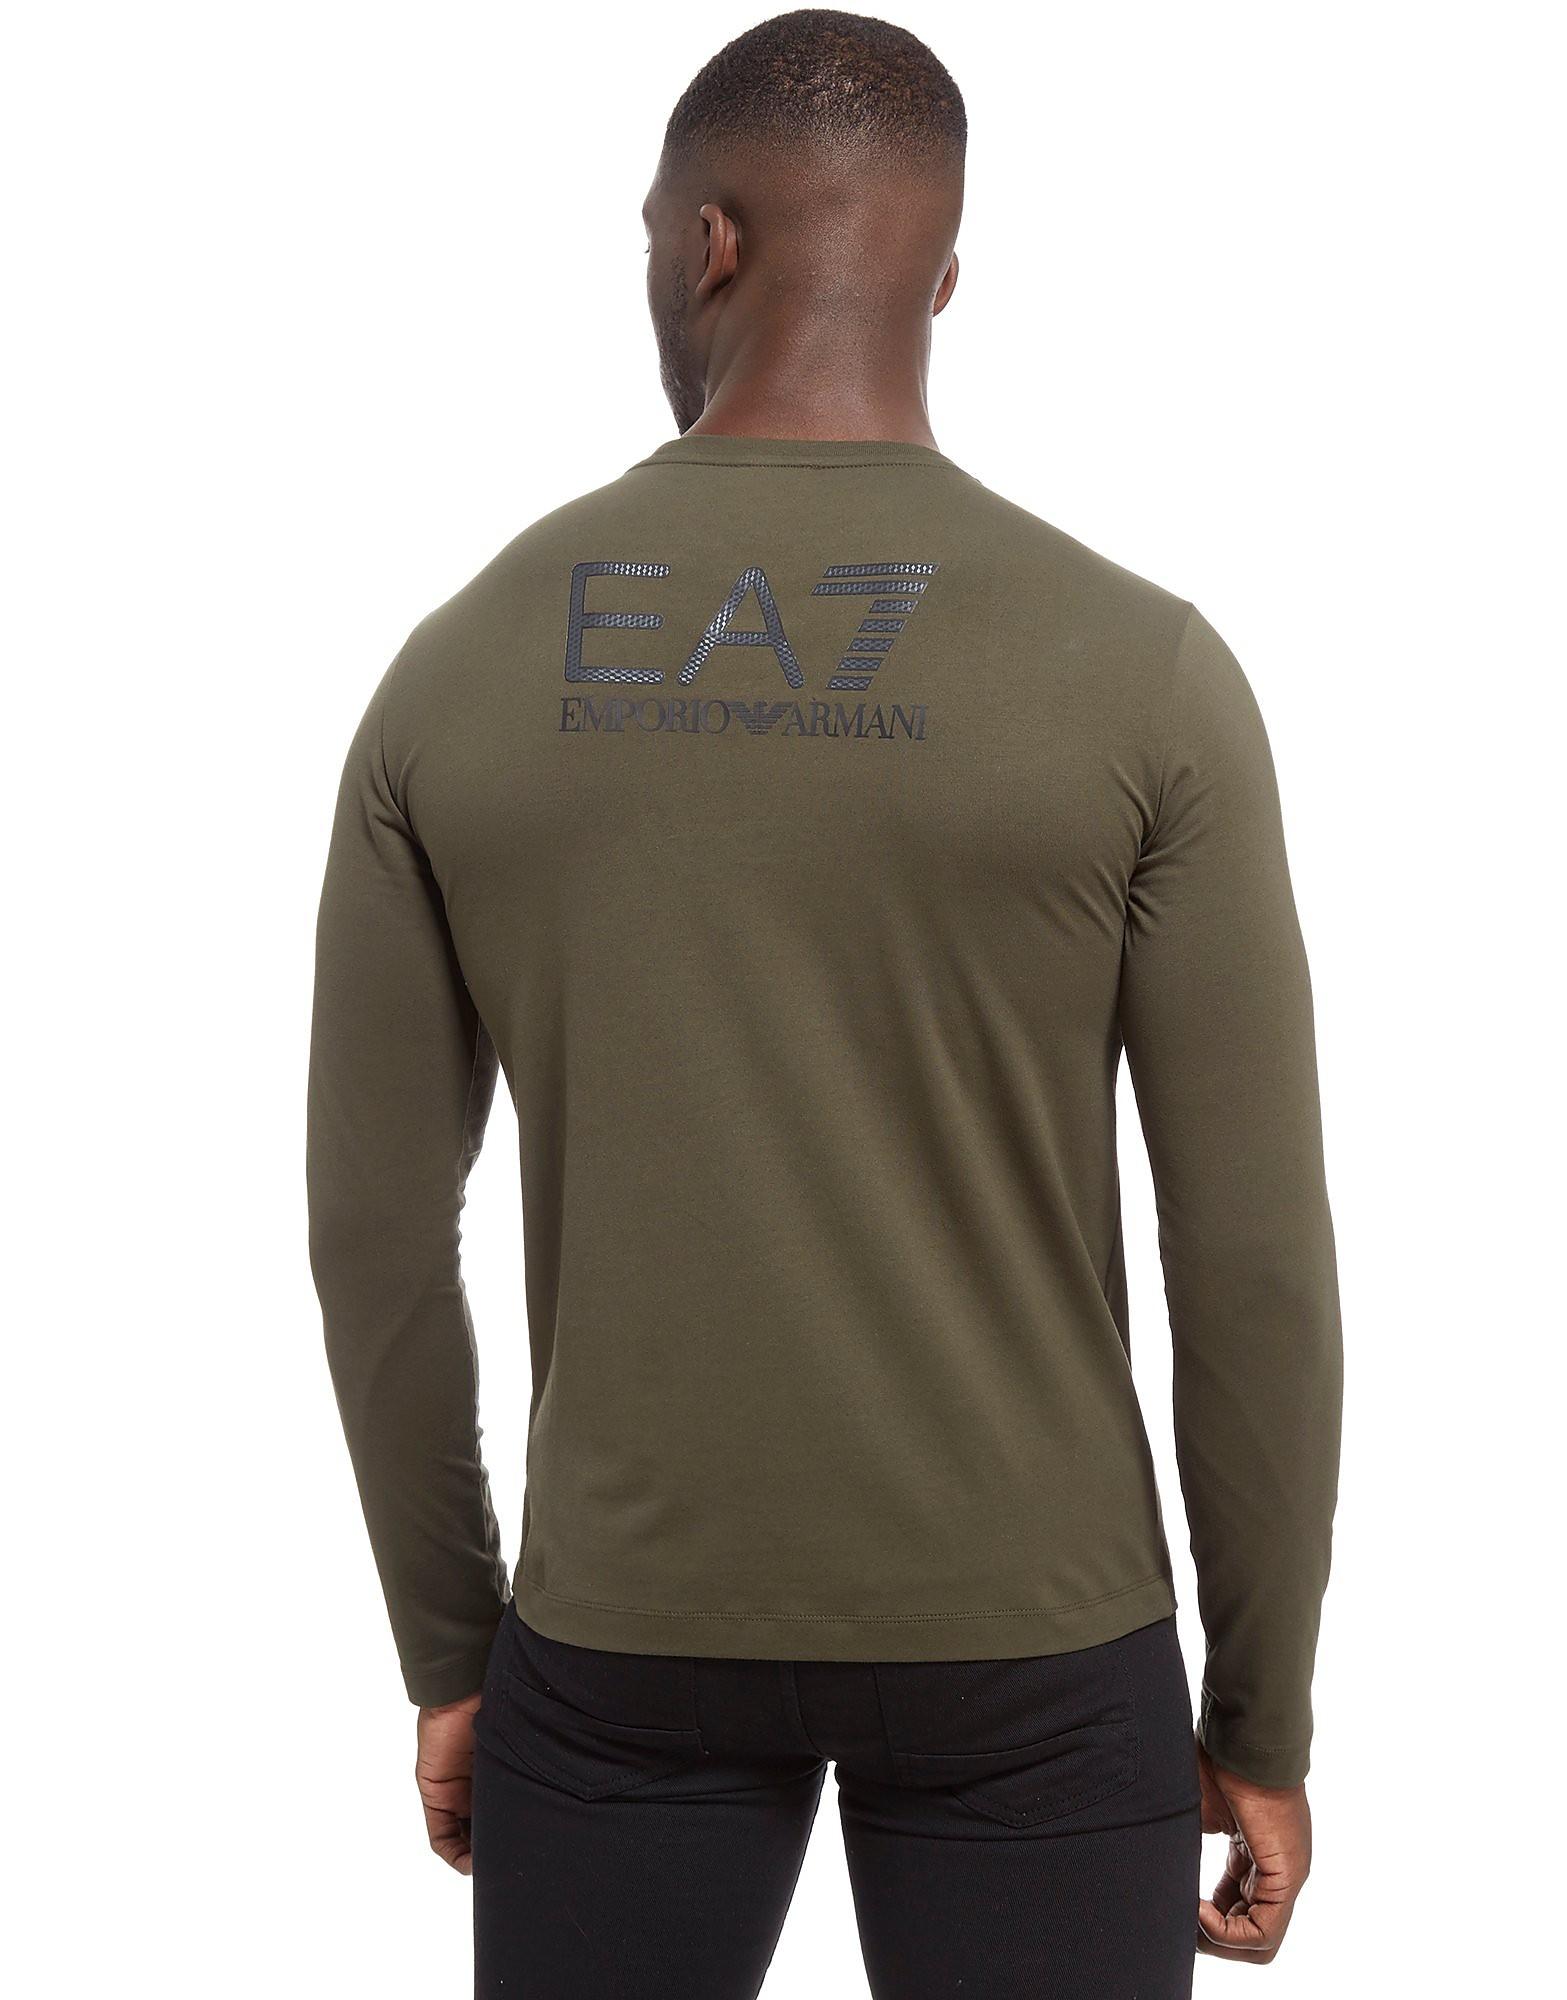 Emporio Armani EA7 Carbon Back Print Long Sleeve T-Shirt Heren